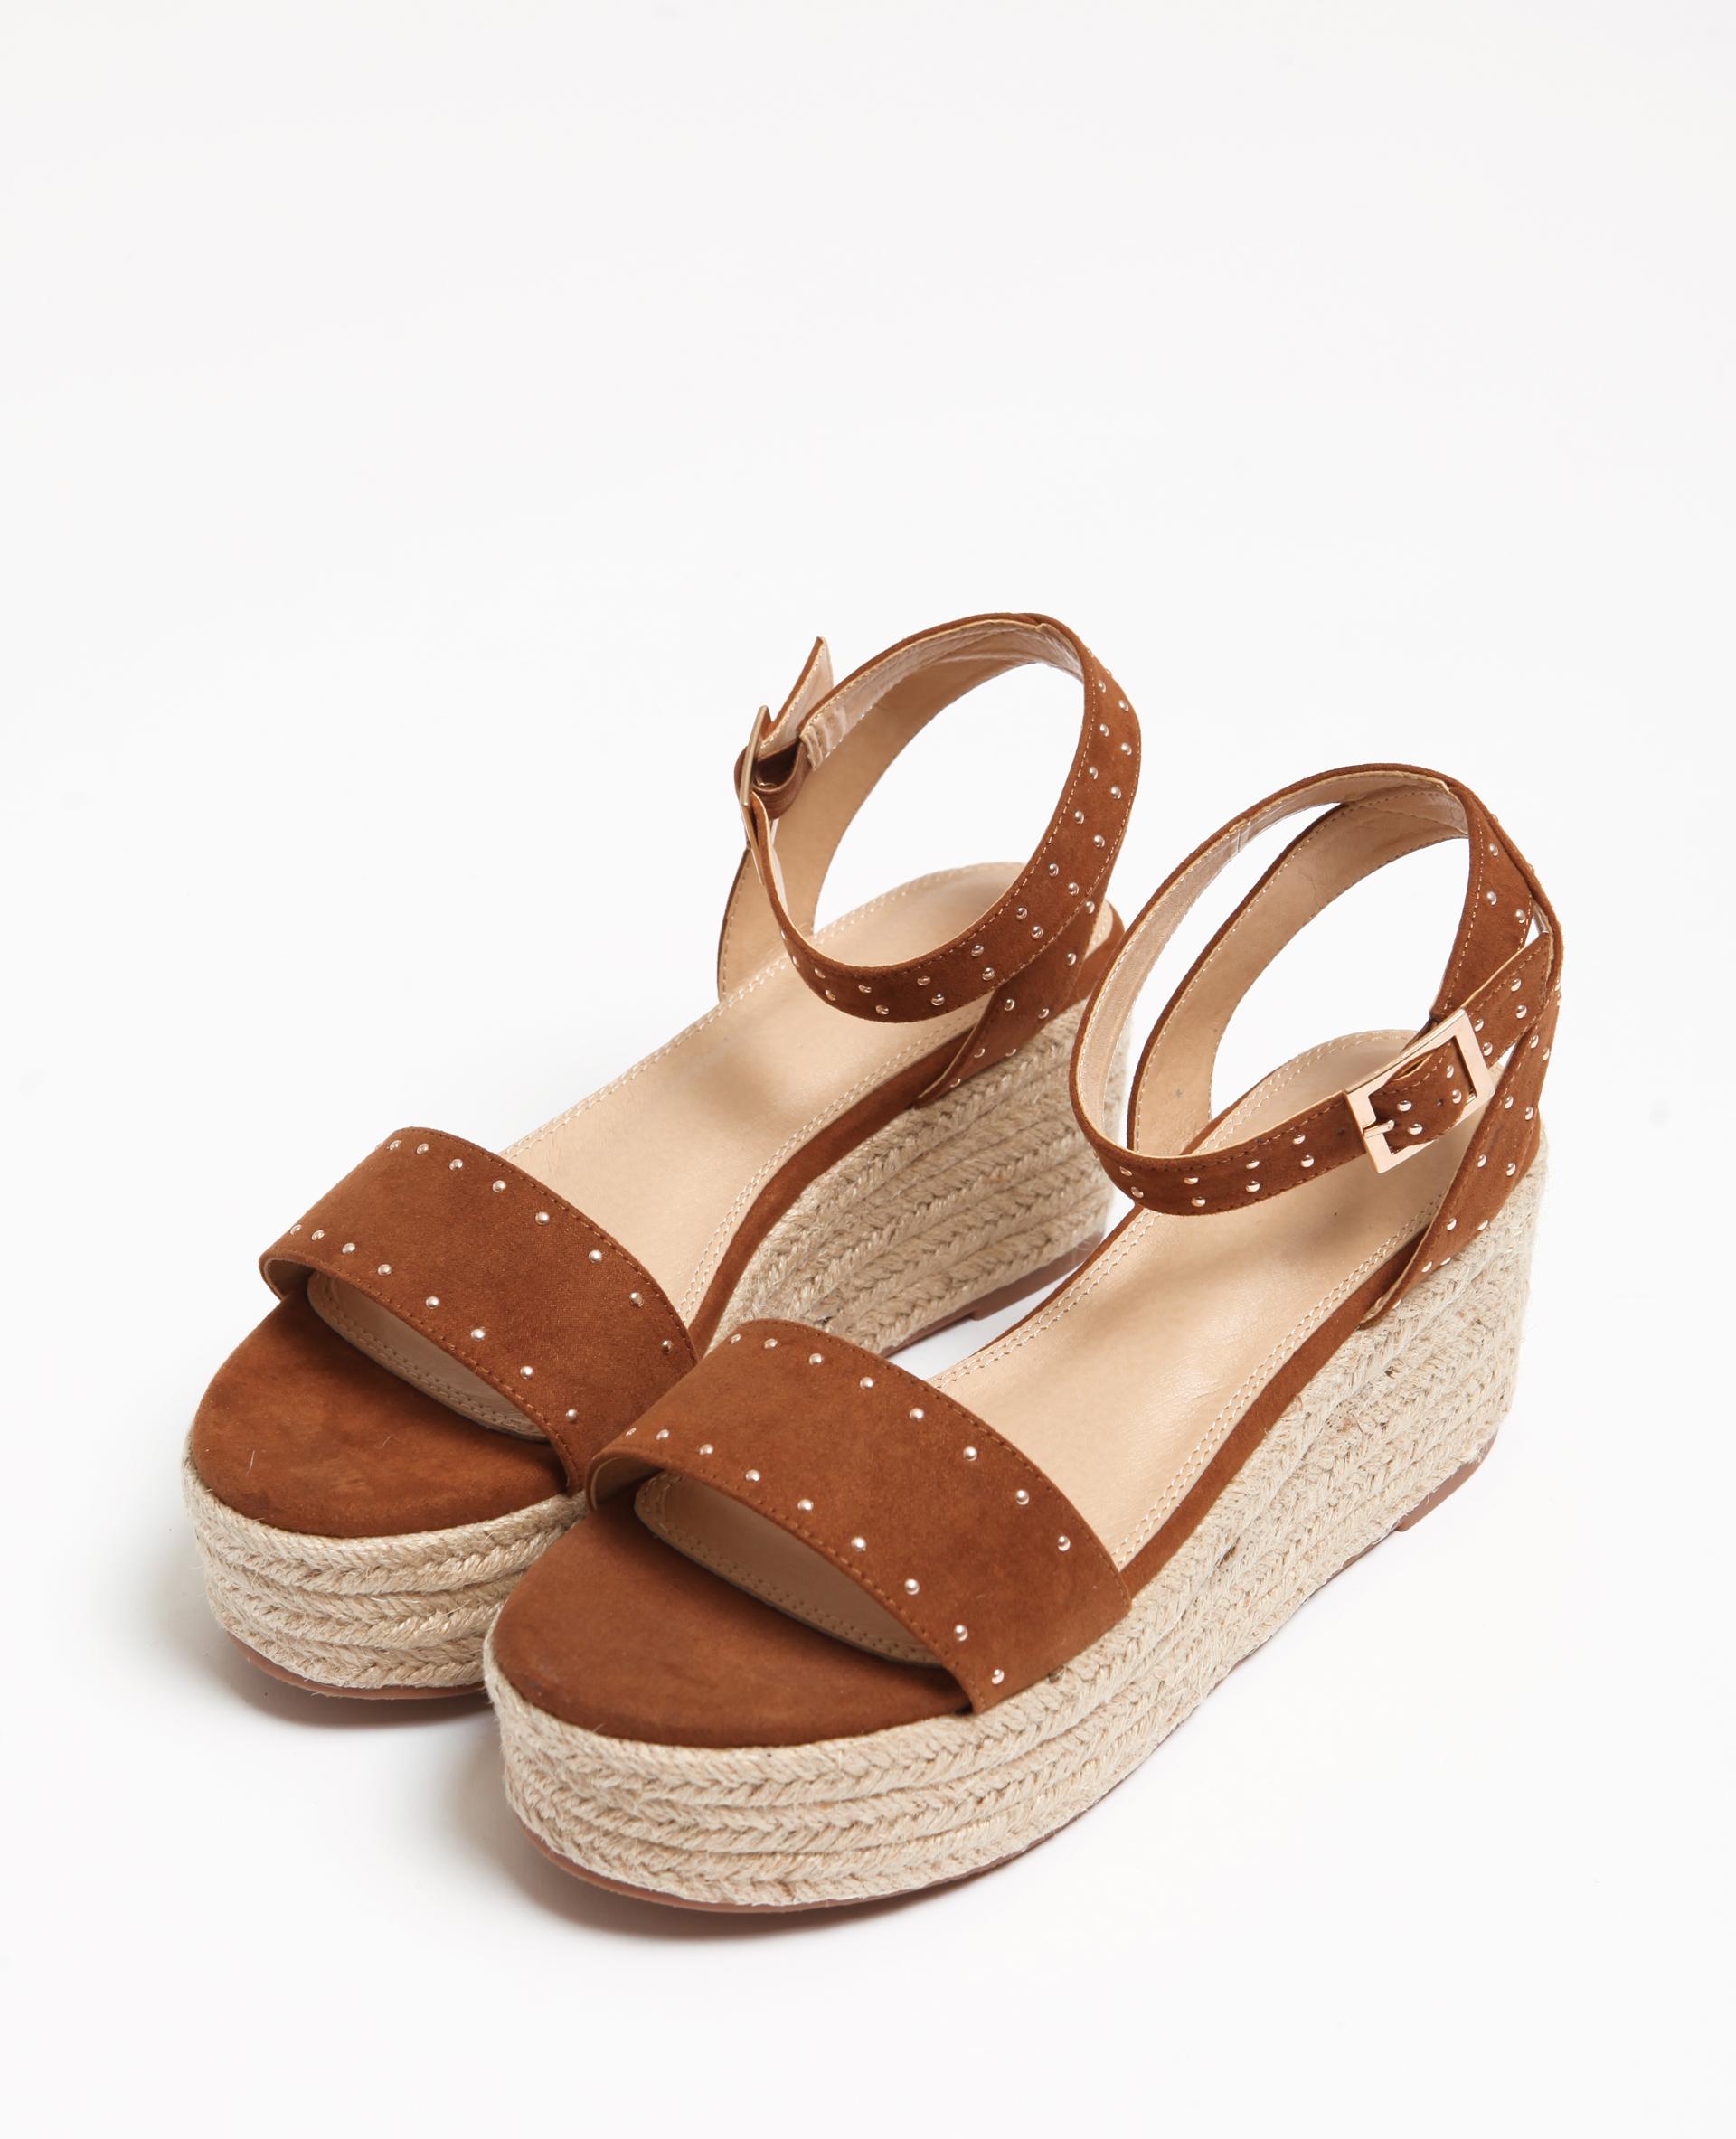 Sandales plateforme marron - Pimkie